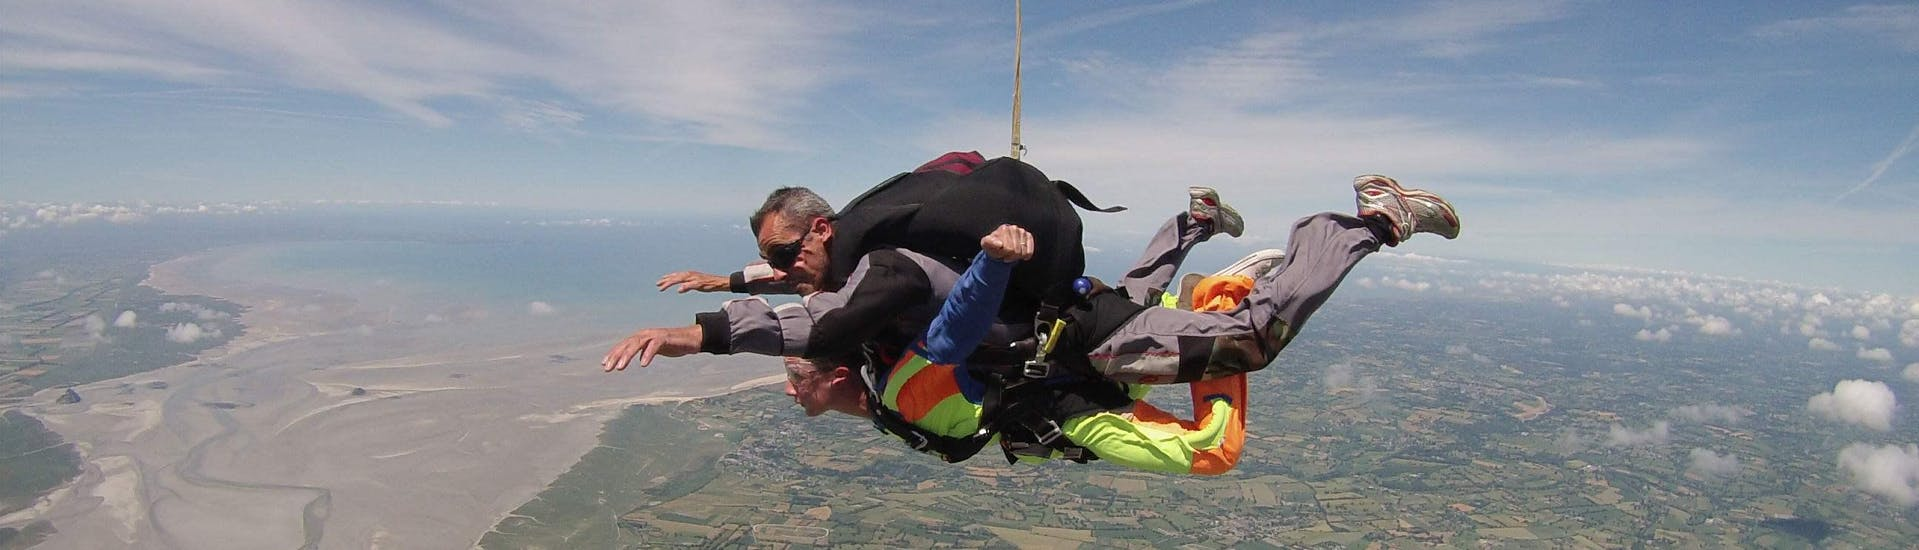 Tandem Skydive above Mont Saint-Michel from 3000m with Abeille Parachutisme Normandie - Hero image